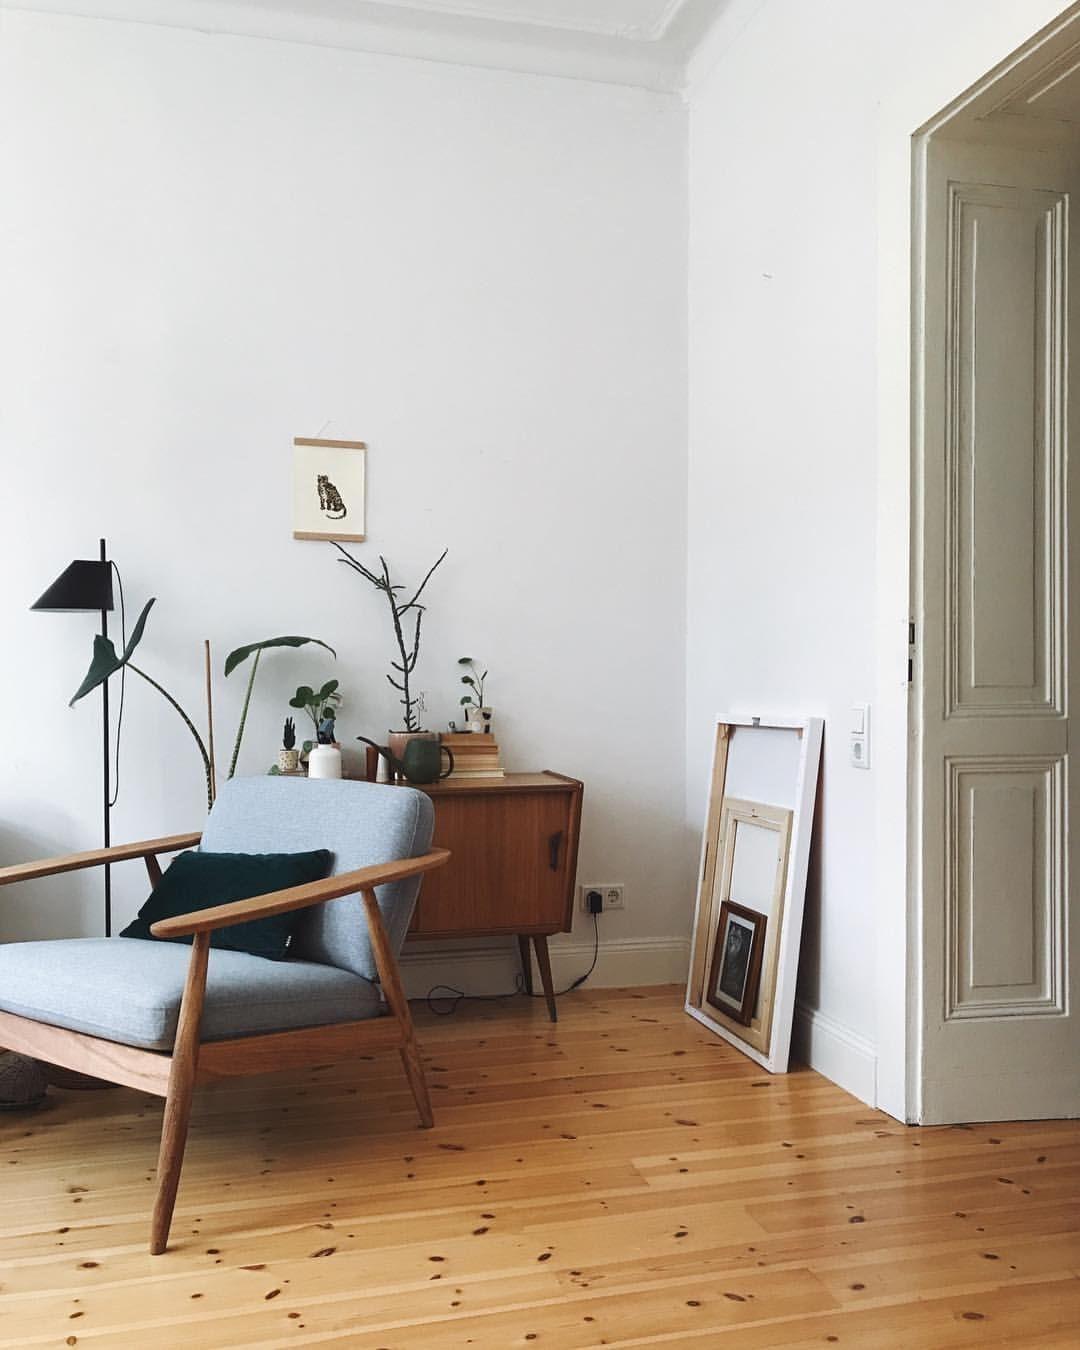 Scandinavian Living Room Design Ideas Inspiration: Minimalist Scandinavian Style Inspired Homes. Minimal Home